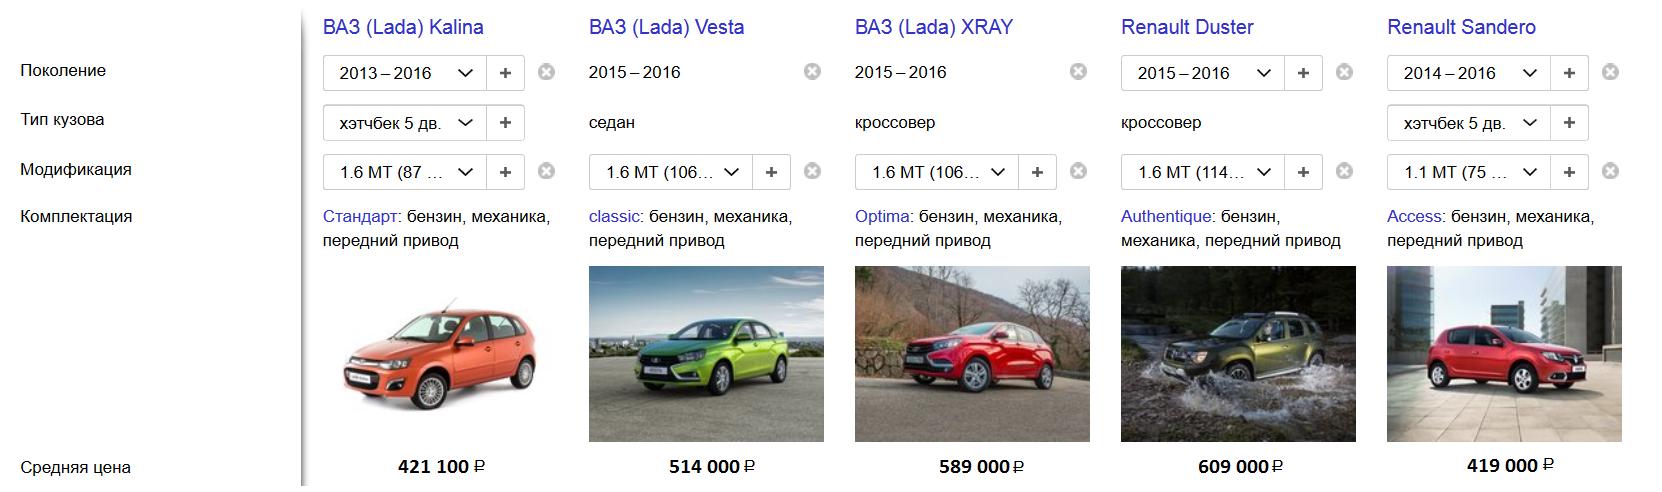 Lada Xray стоимость